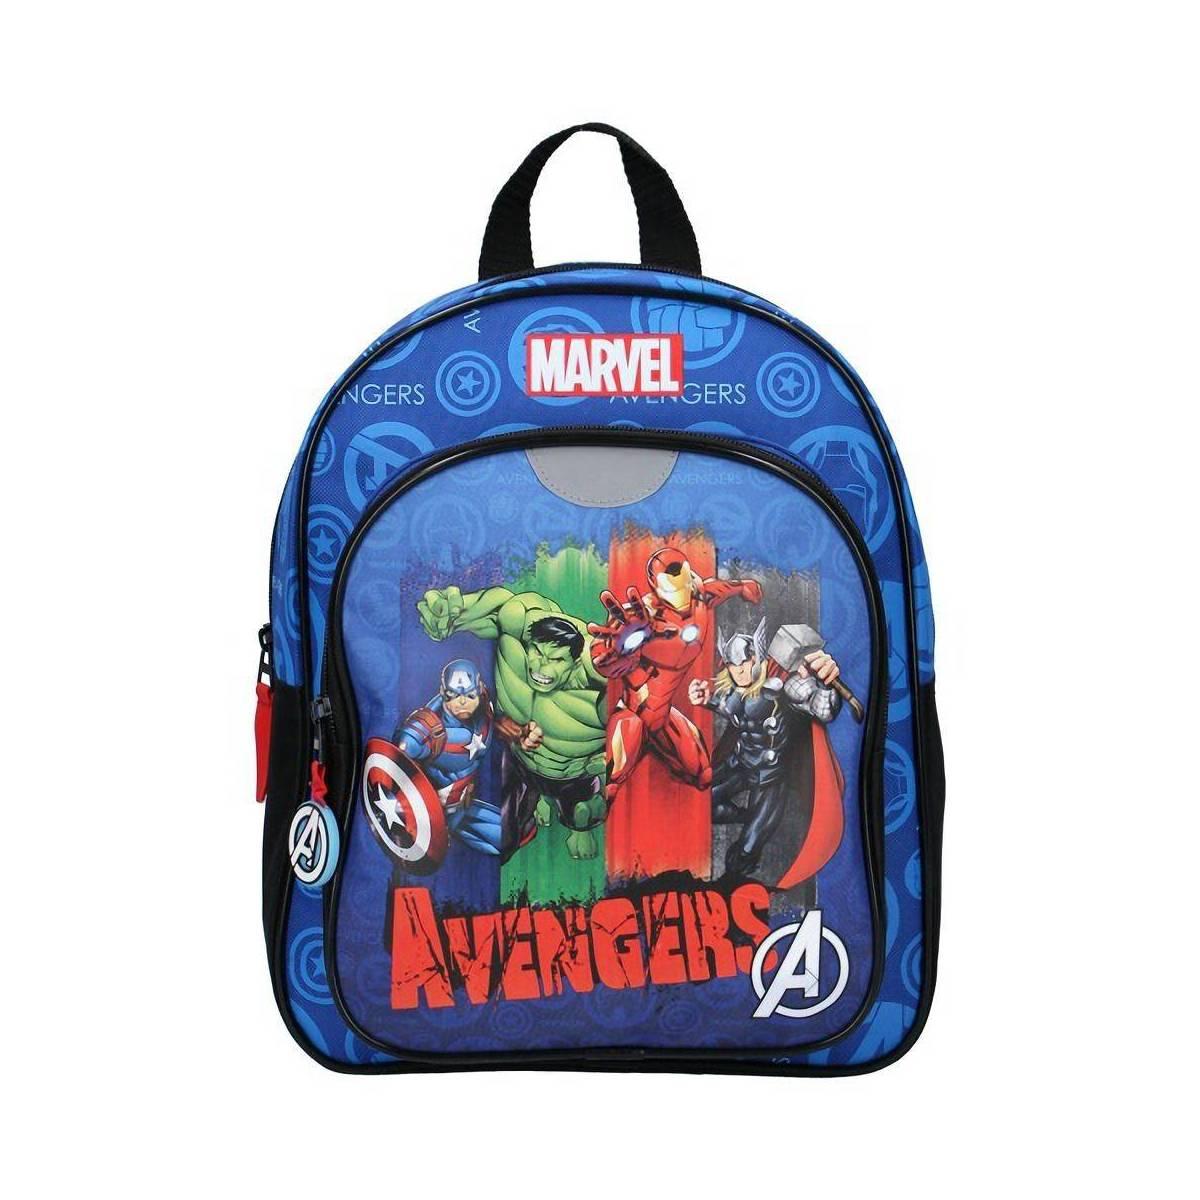 Marvel The Avengers Armor Up! Small Backpack 31 cm